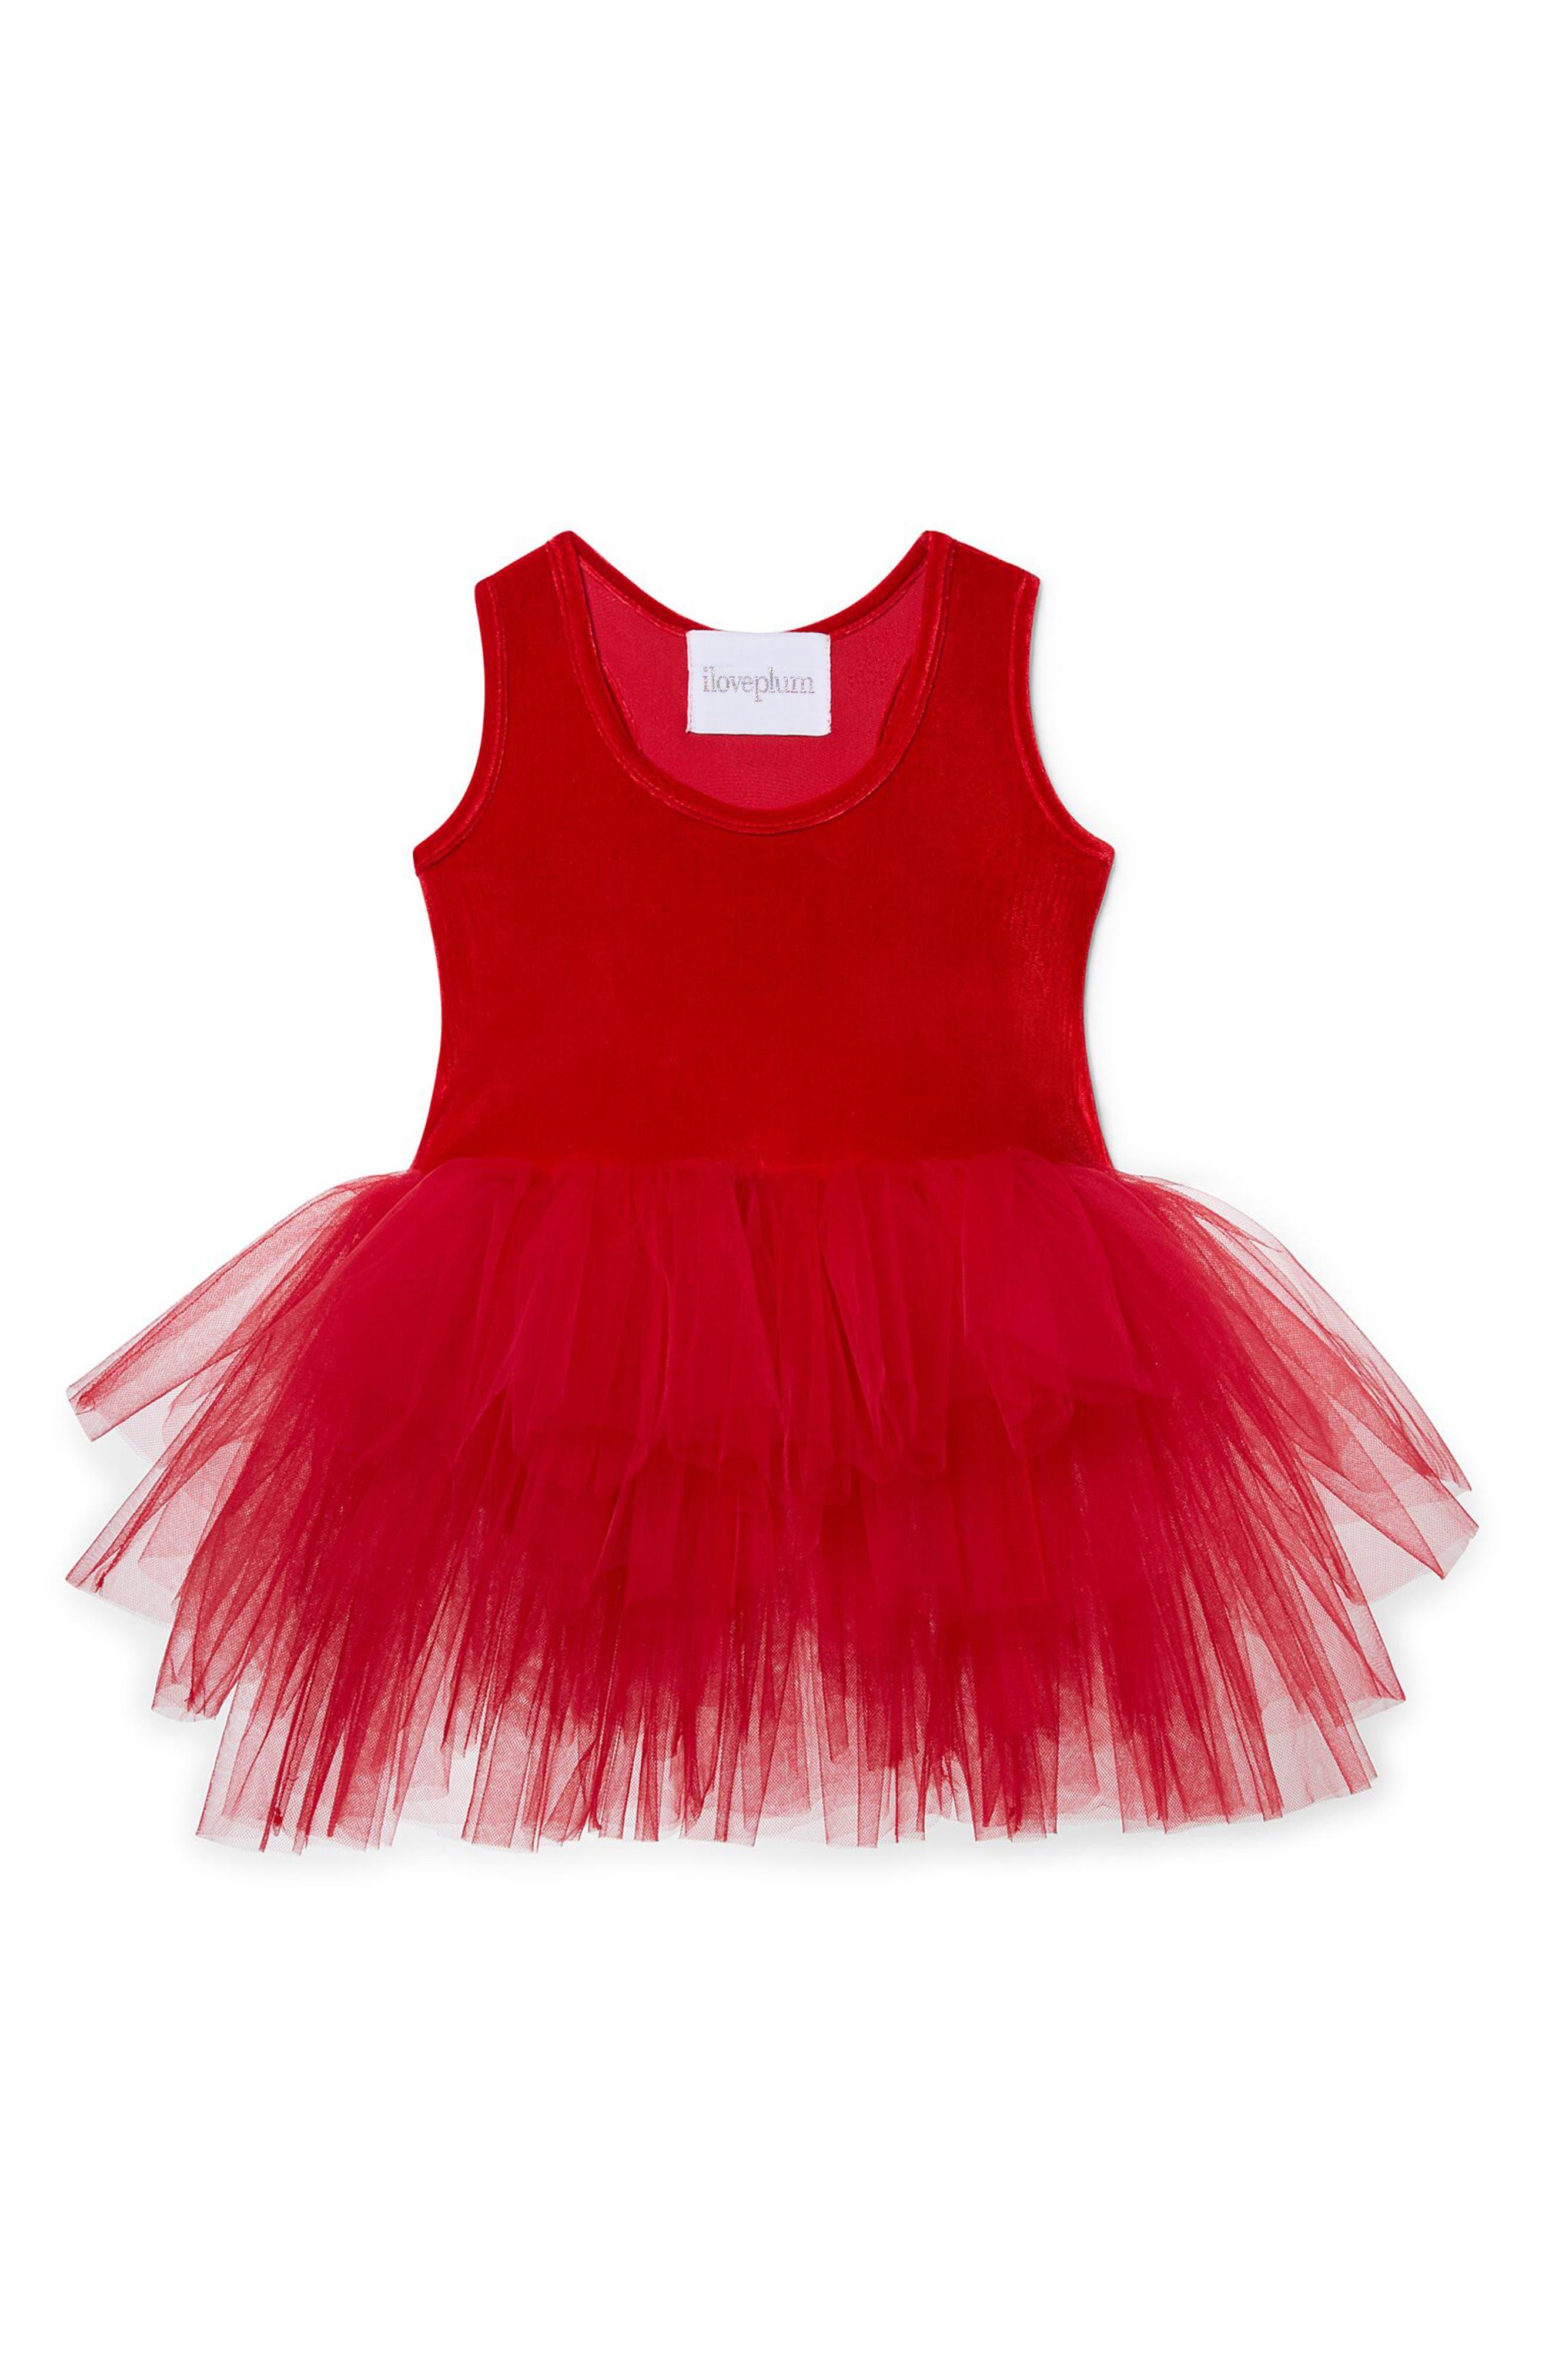 Velvet & Tulle Tutu Dress,                             Main thumbnail 1, color,                             600